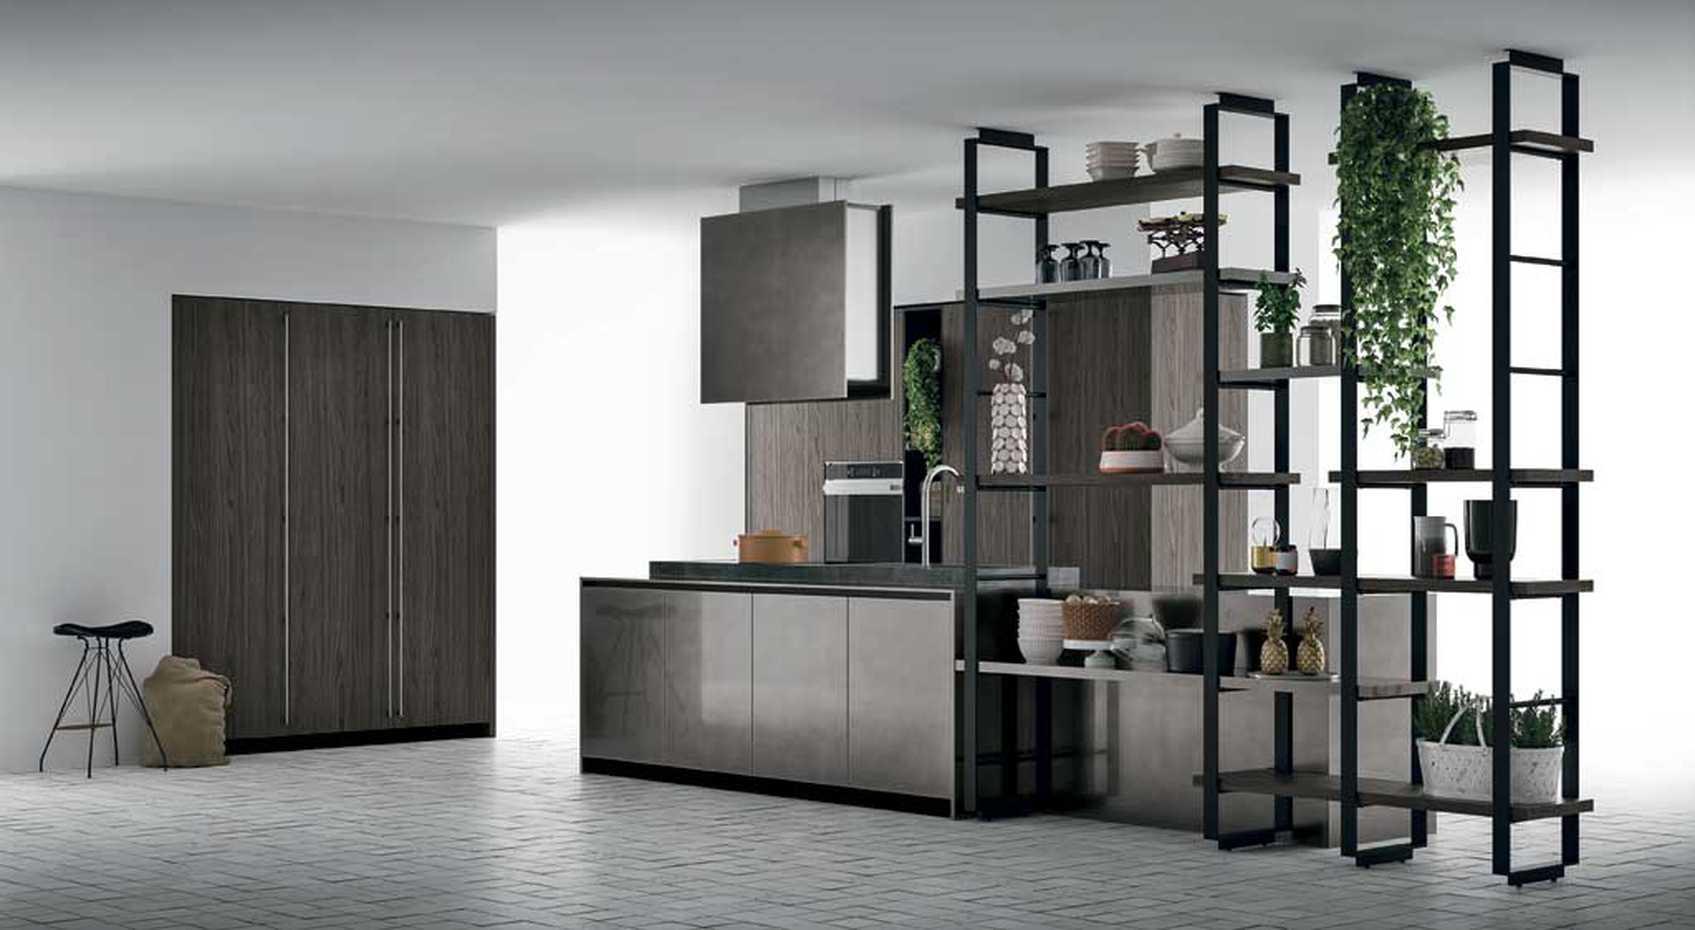 SoHo by Doimo Cucine product image 2